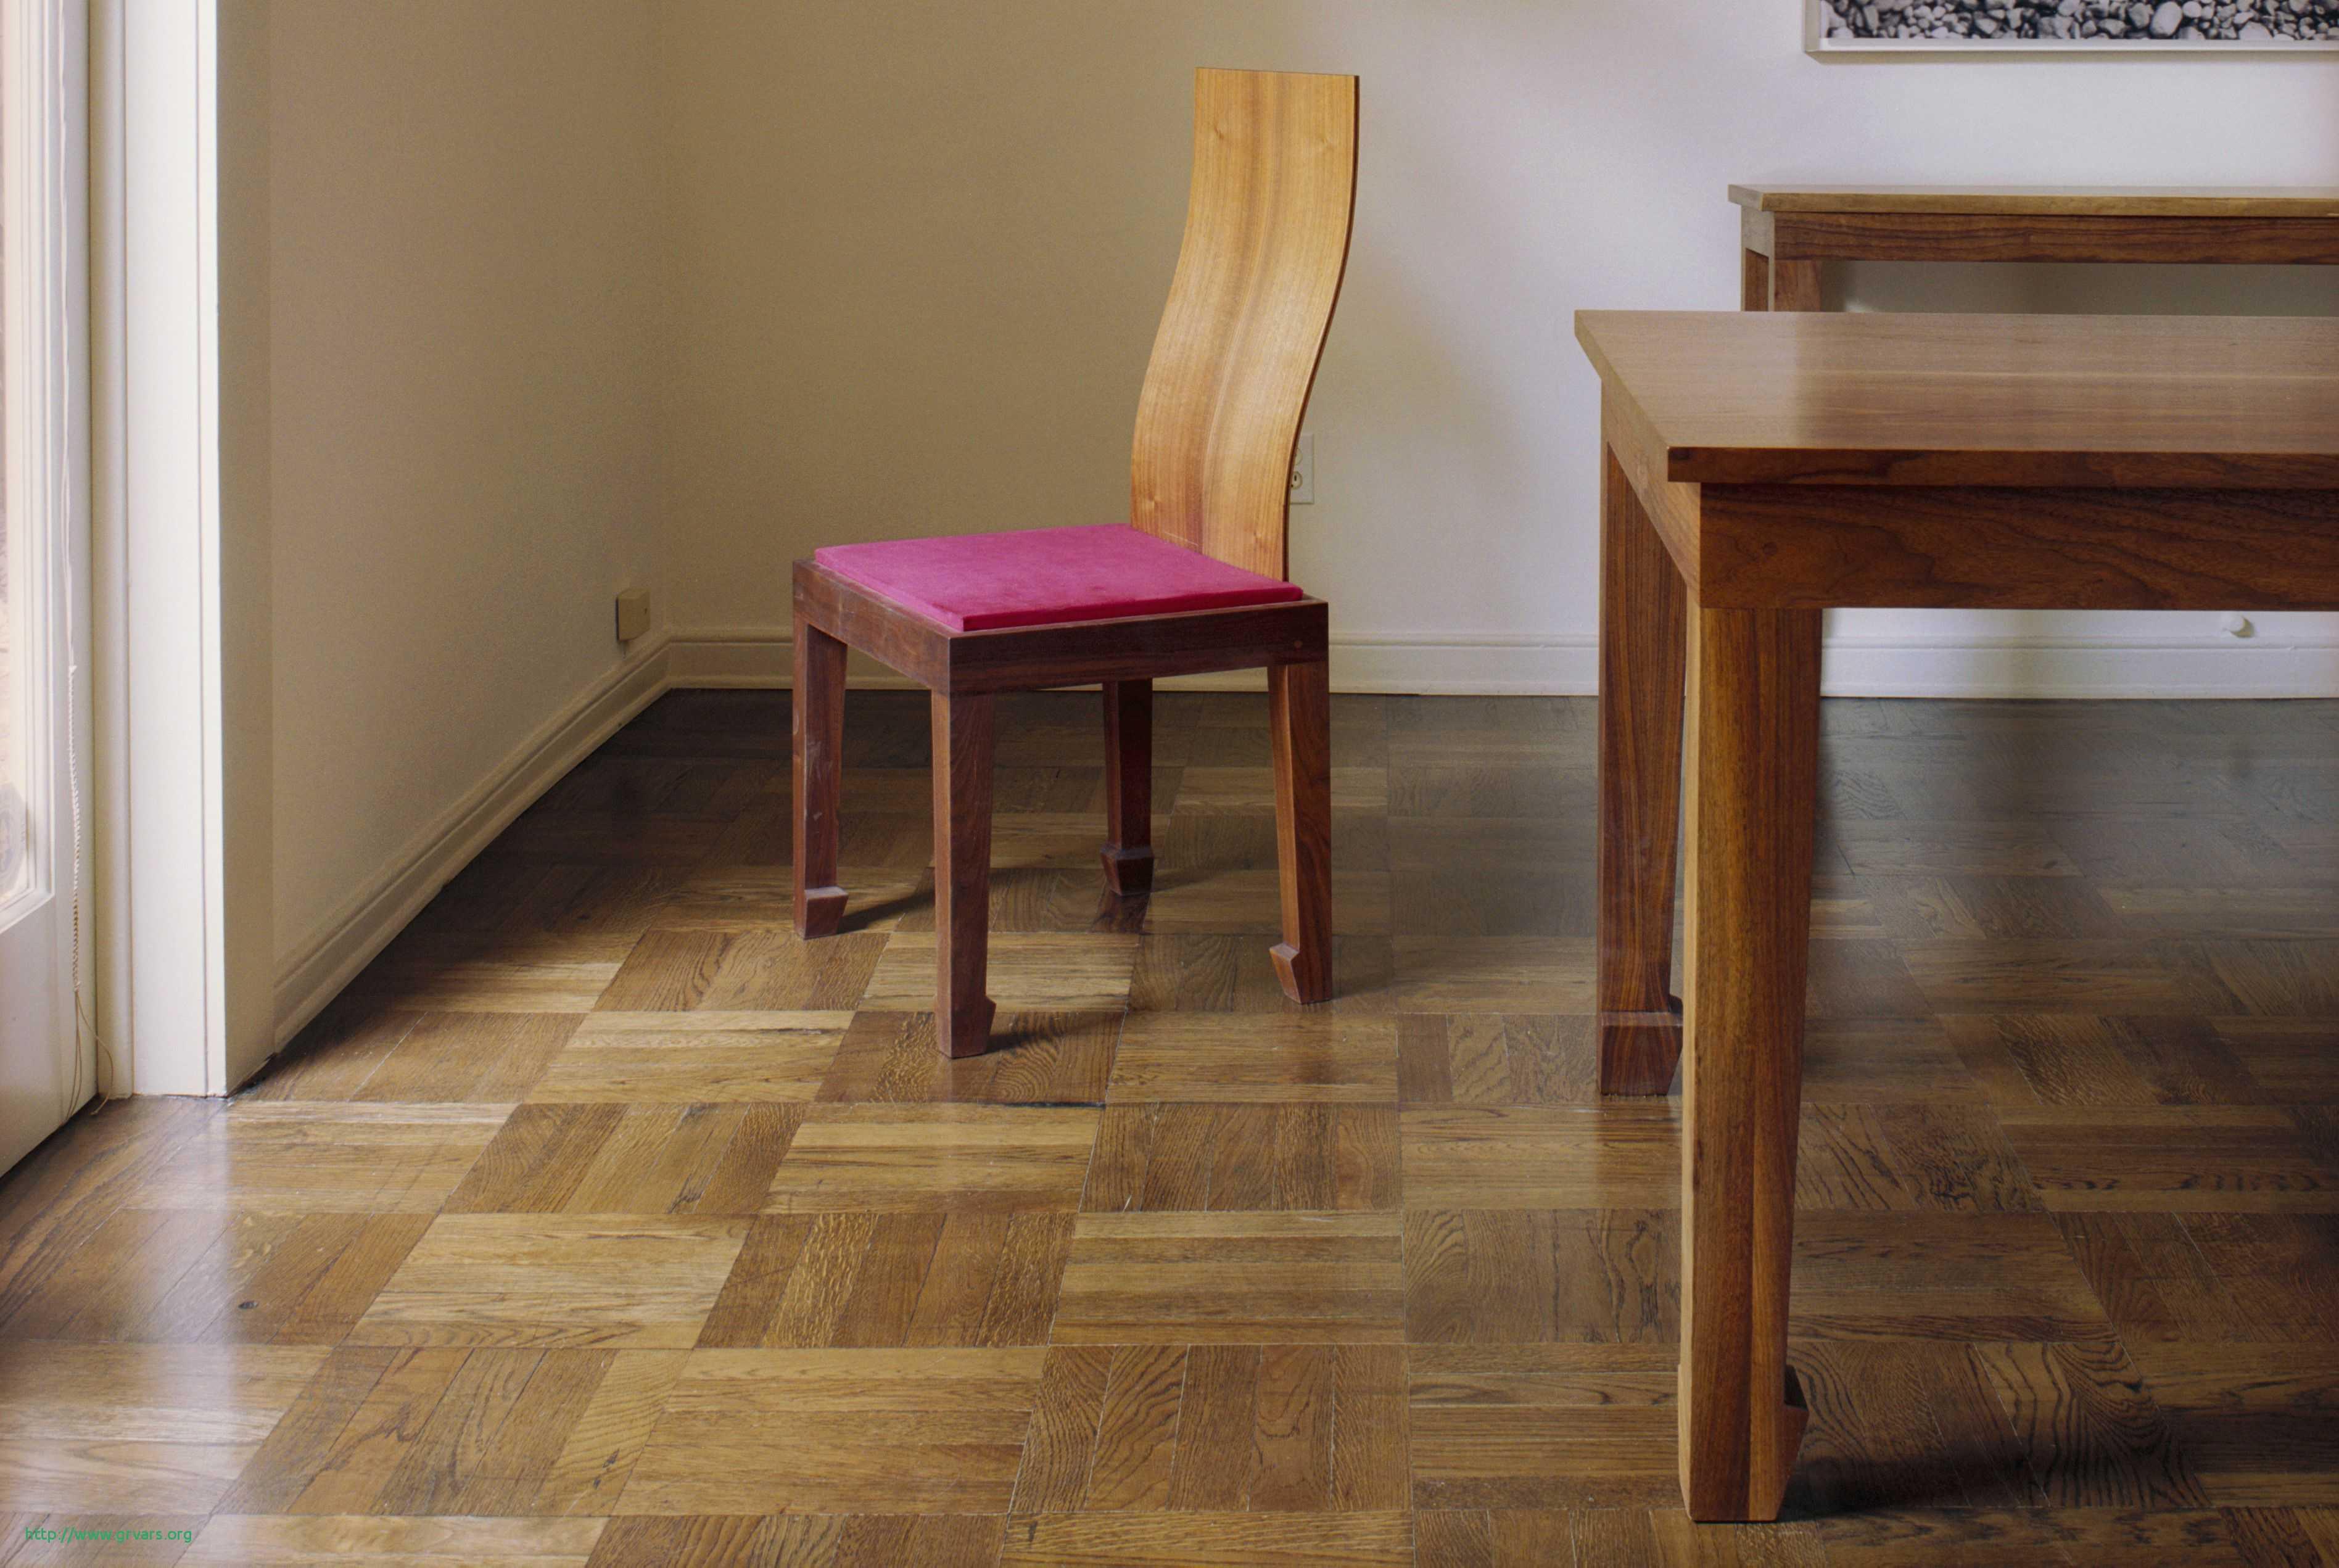 aaa hardwood floors phoenix az of 19 frais laminate flooring compared to hardwood ideas blog intended for laminate flooring compared to hardwood nouveau wood parquet flooring poised for a resurgence